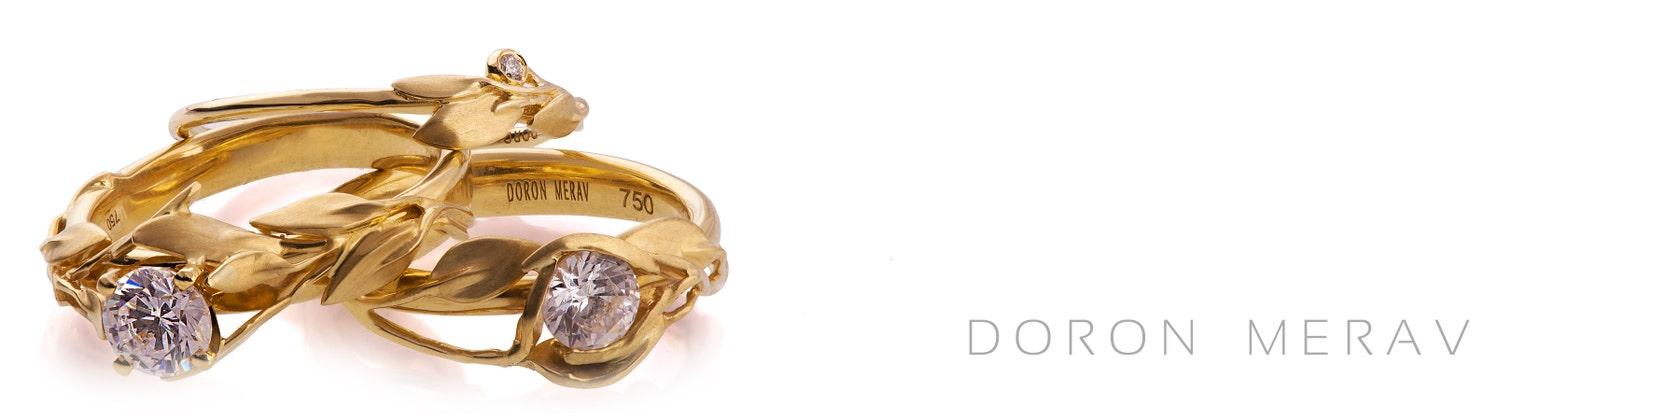 3ee61daa9ff1a9 Doron Merav Jewelry by doronmerav on Etsy